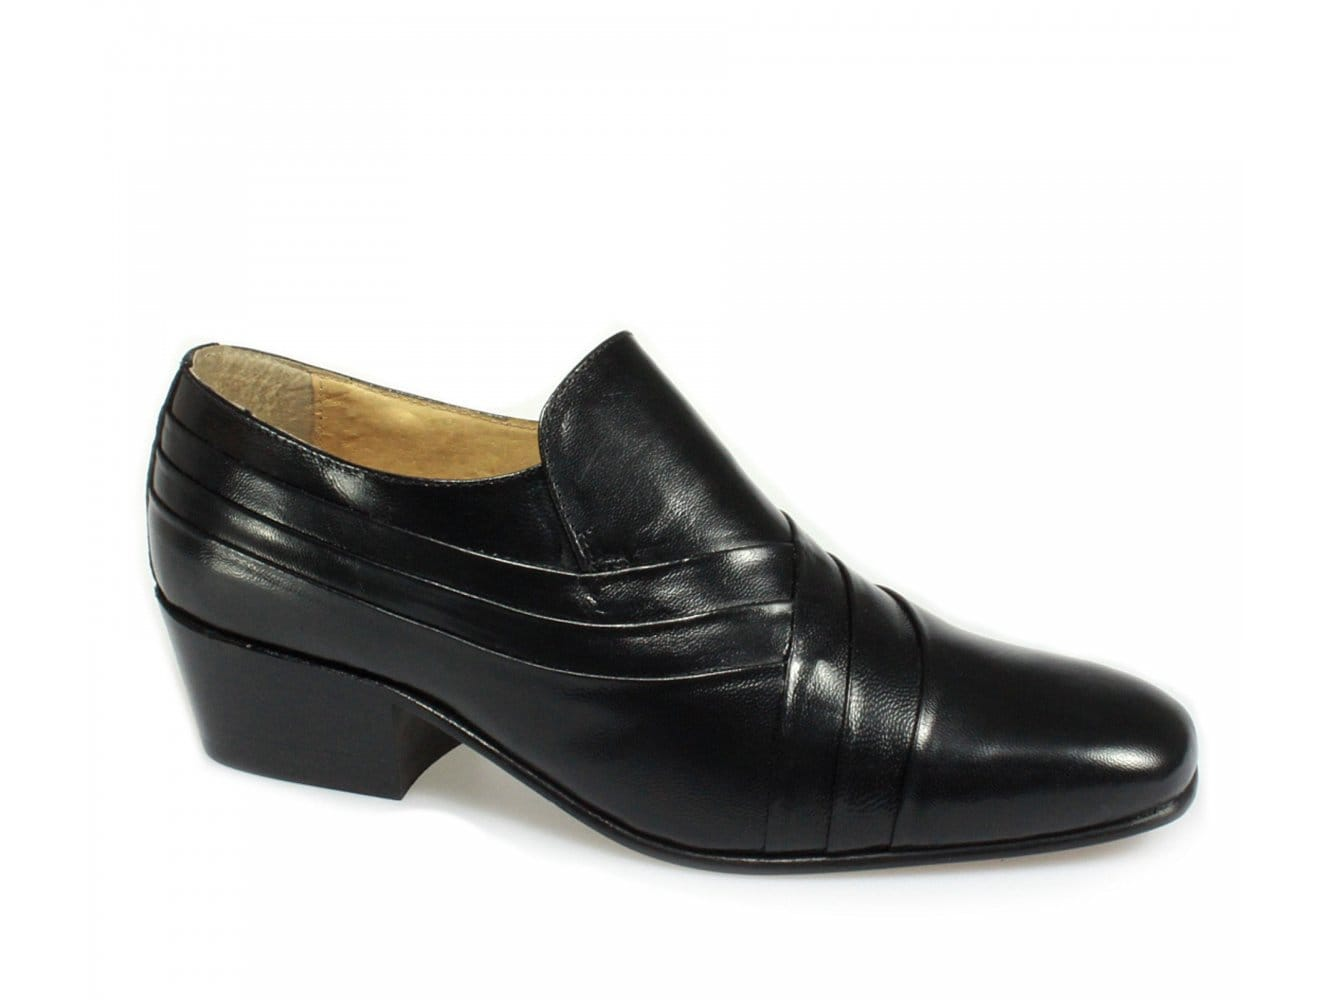 Mens Montecatini Cuban Heels Black Leather Shoes